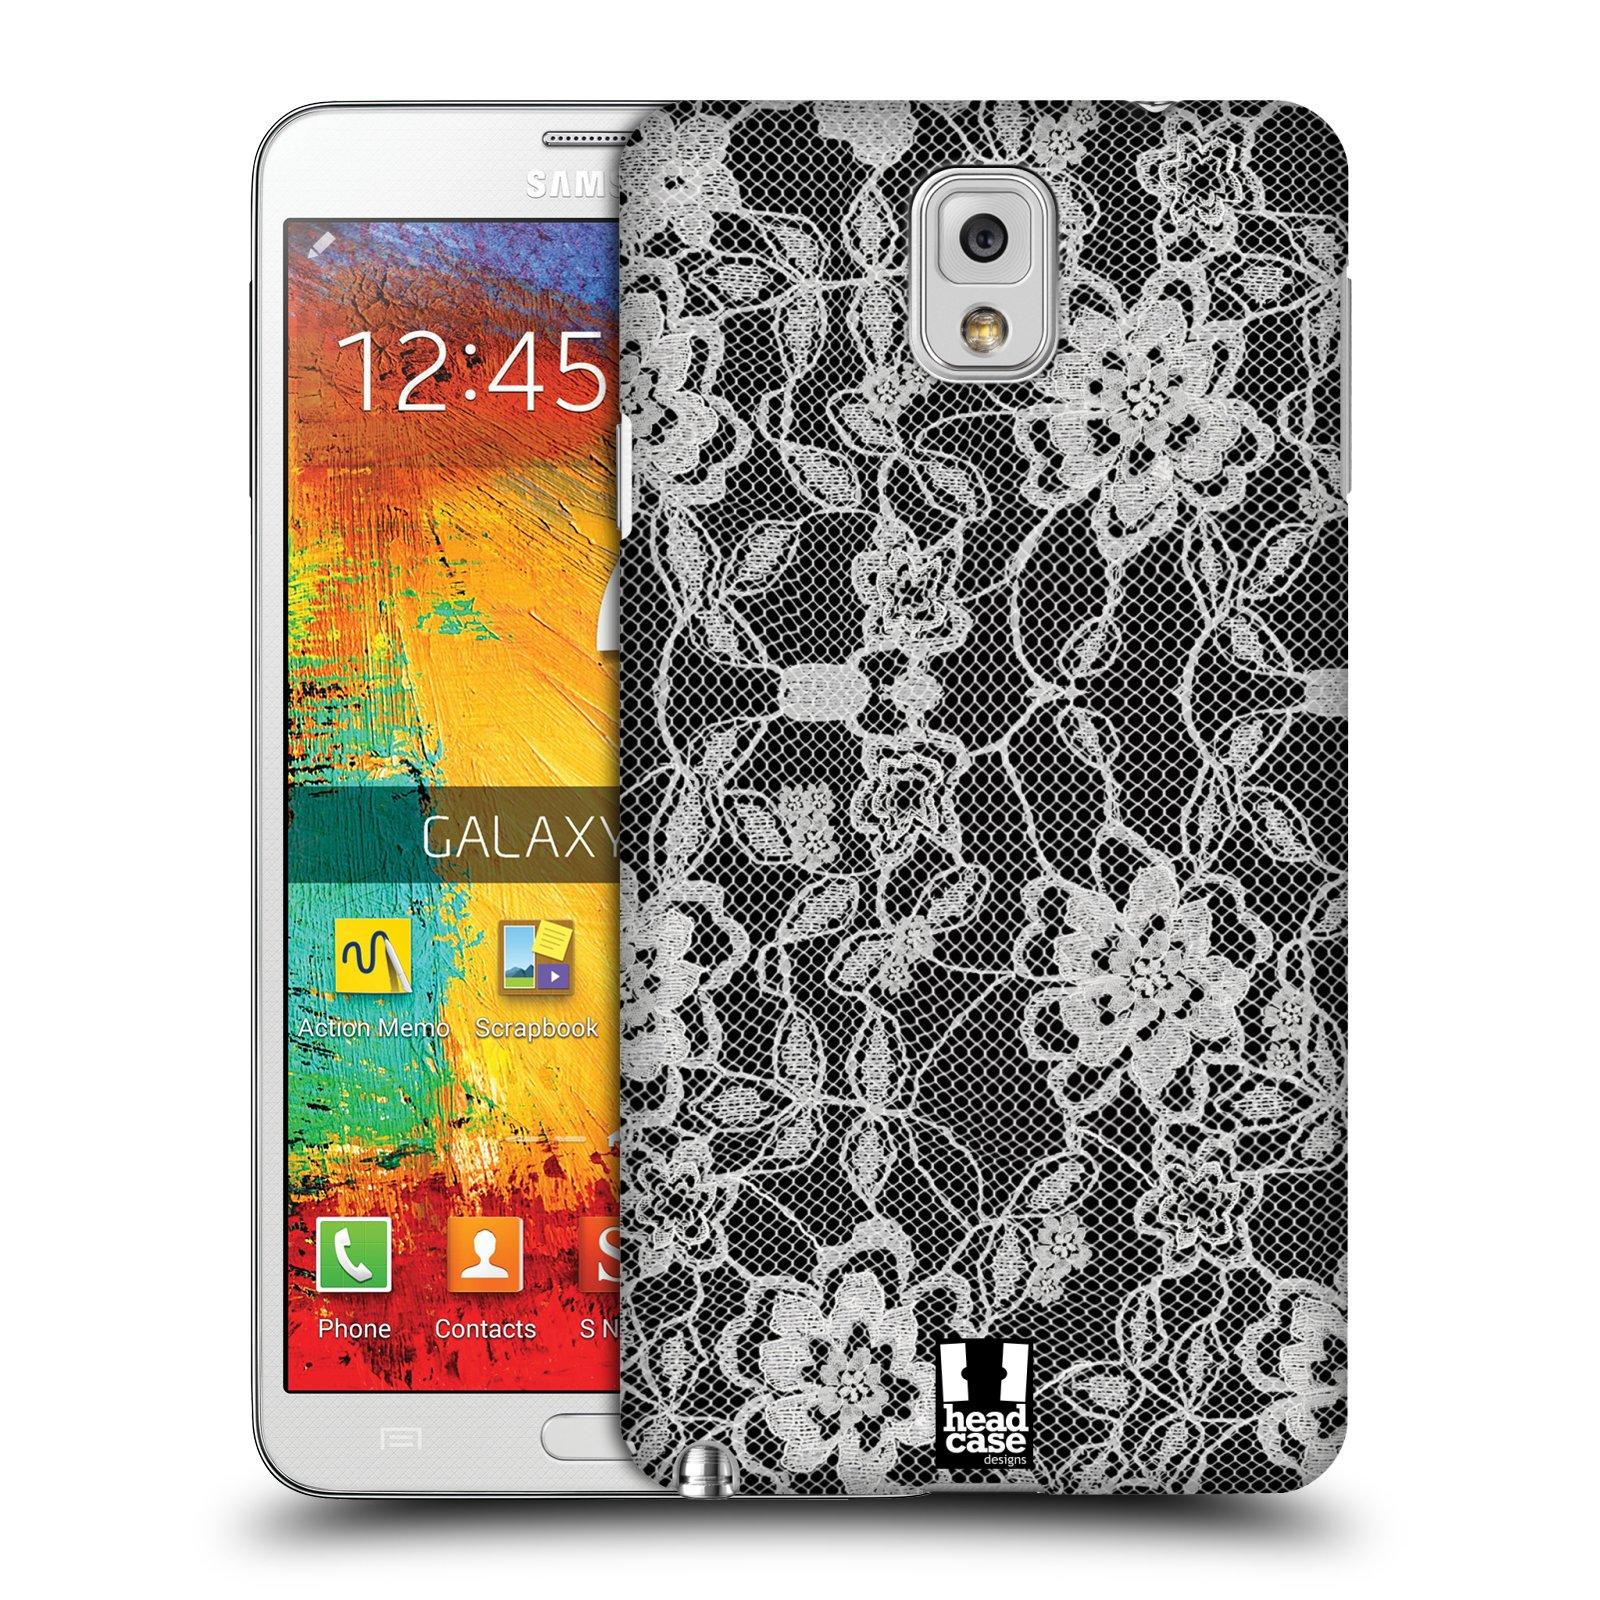 Plastové pouzdro na mobil Samsung Galaxy Note 3 HEAD CASE FLOWERY KRAJKA (Kryt či obal na mobilní telefon Samsung Galaxy Note 3 SM-N9005)